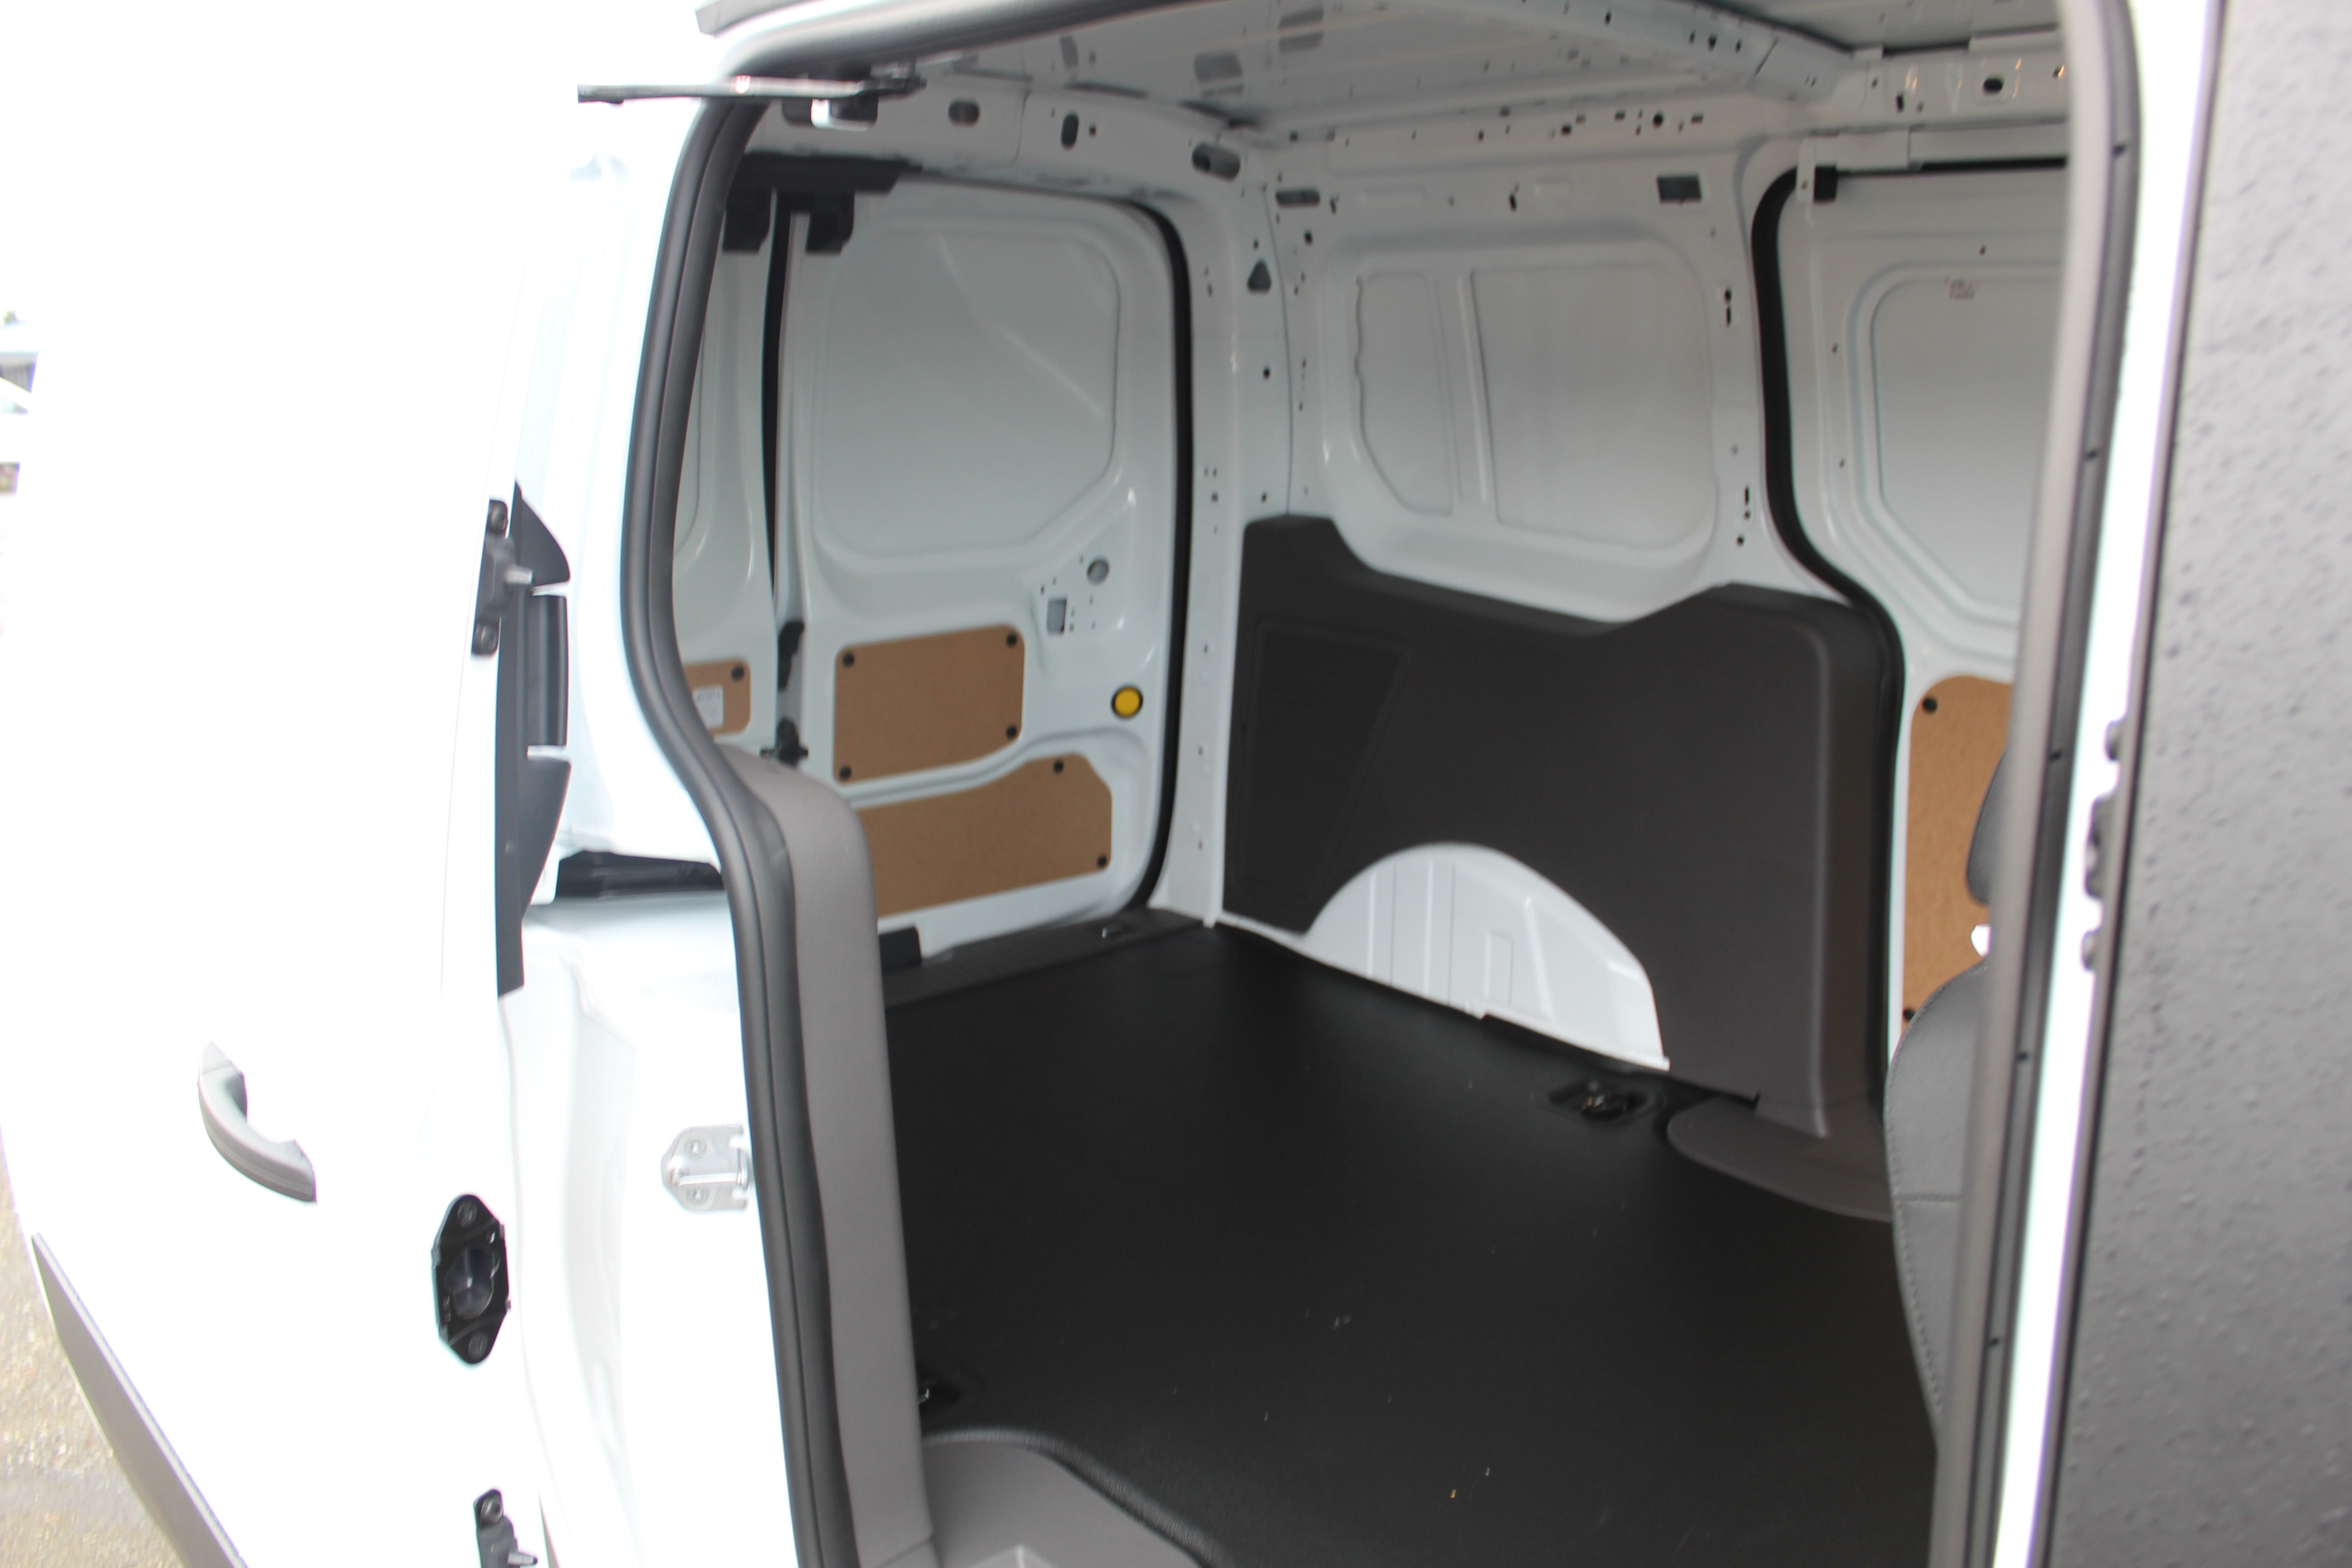 2020 Transit Connect, Empty Cargo Van #E9063 - photo 9